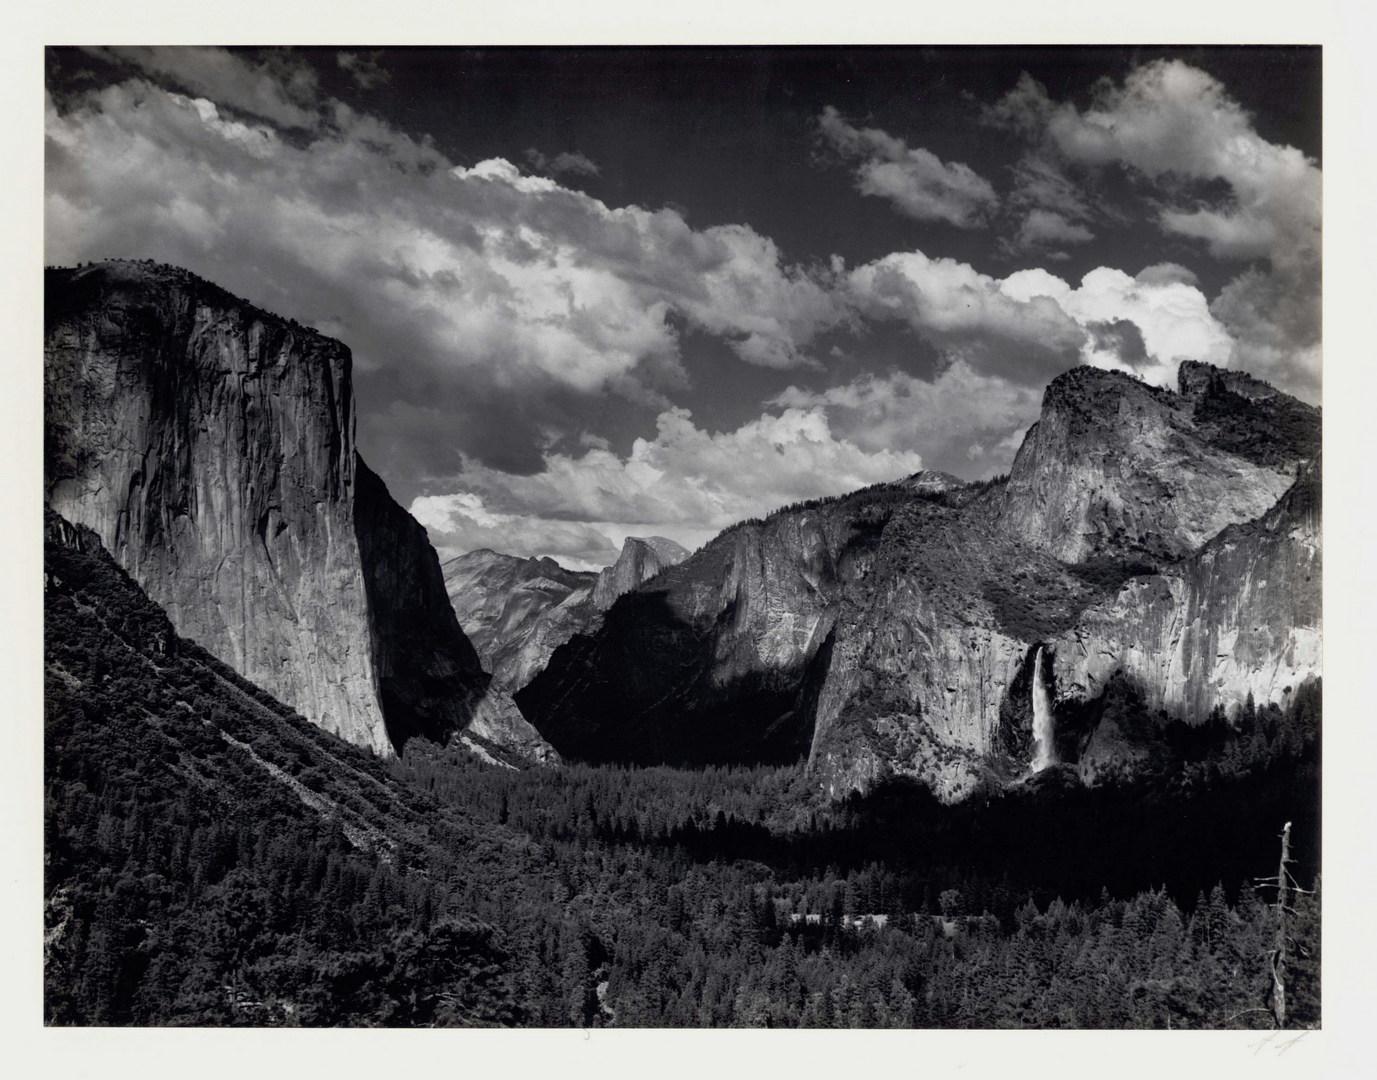 Lot 158 Ansel Adams 18 Folio Spec Ed Yosemite